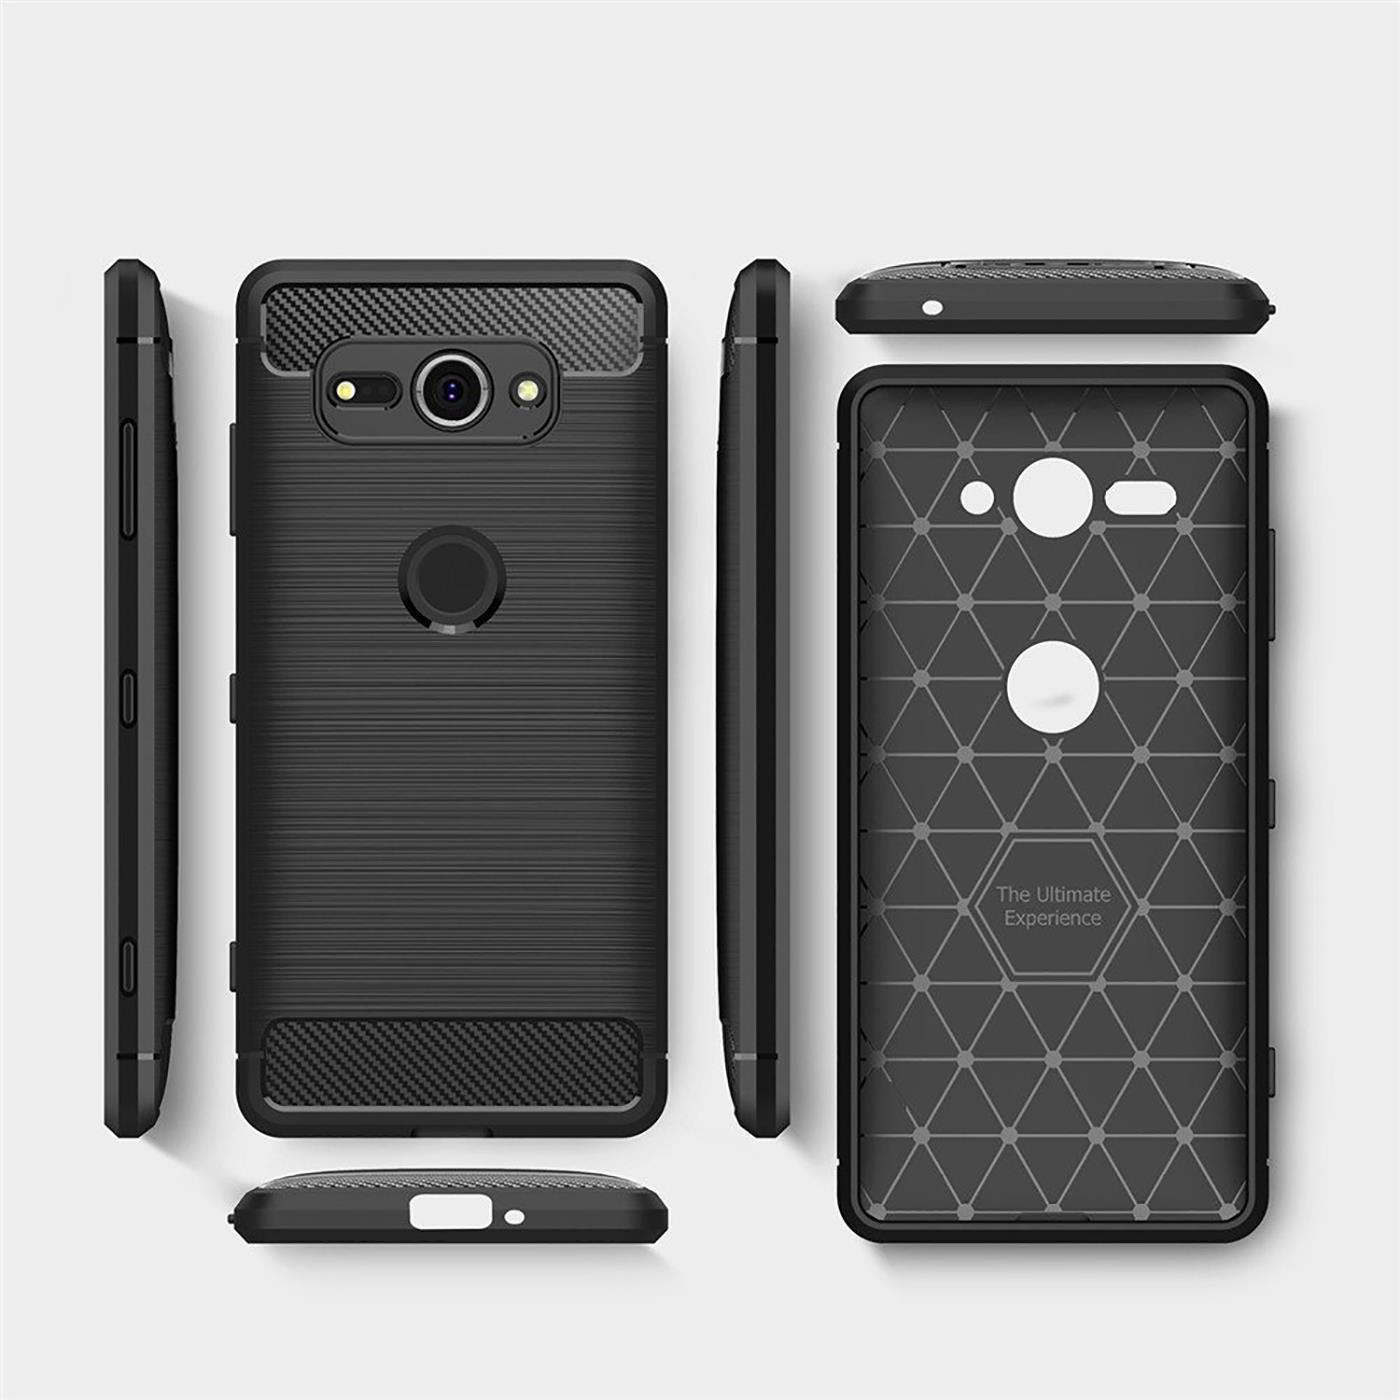 Coque-carbone-pour-Sony-Xperia-xz2-Compact-Etui-de-protection-portable-case-hybride-TPU-Cover miniature 10